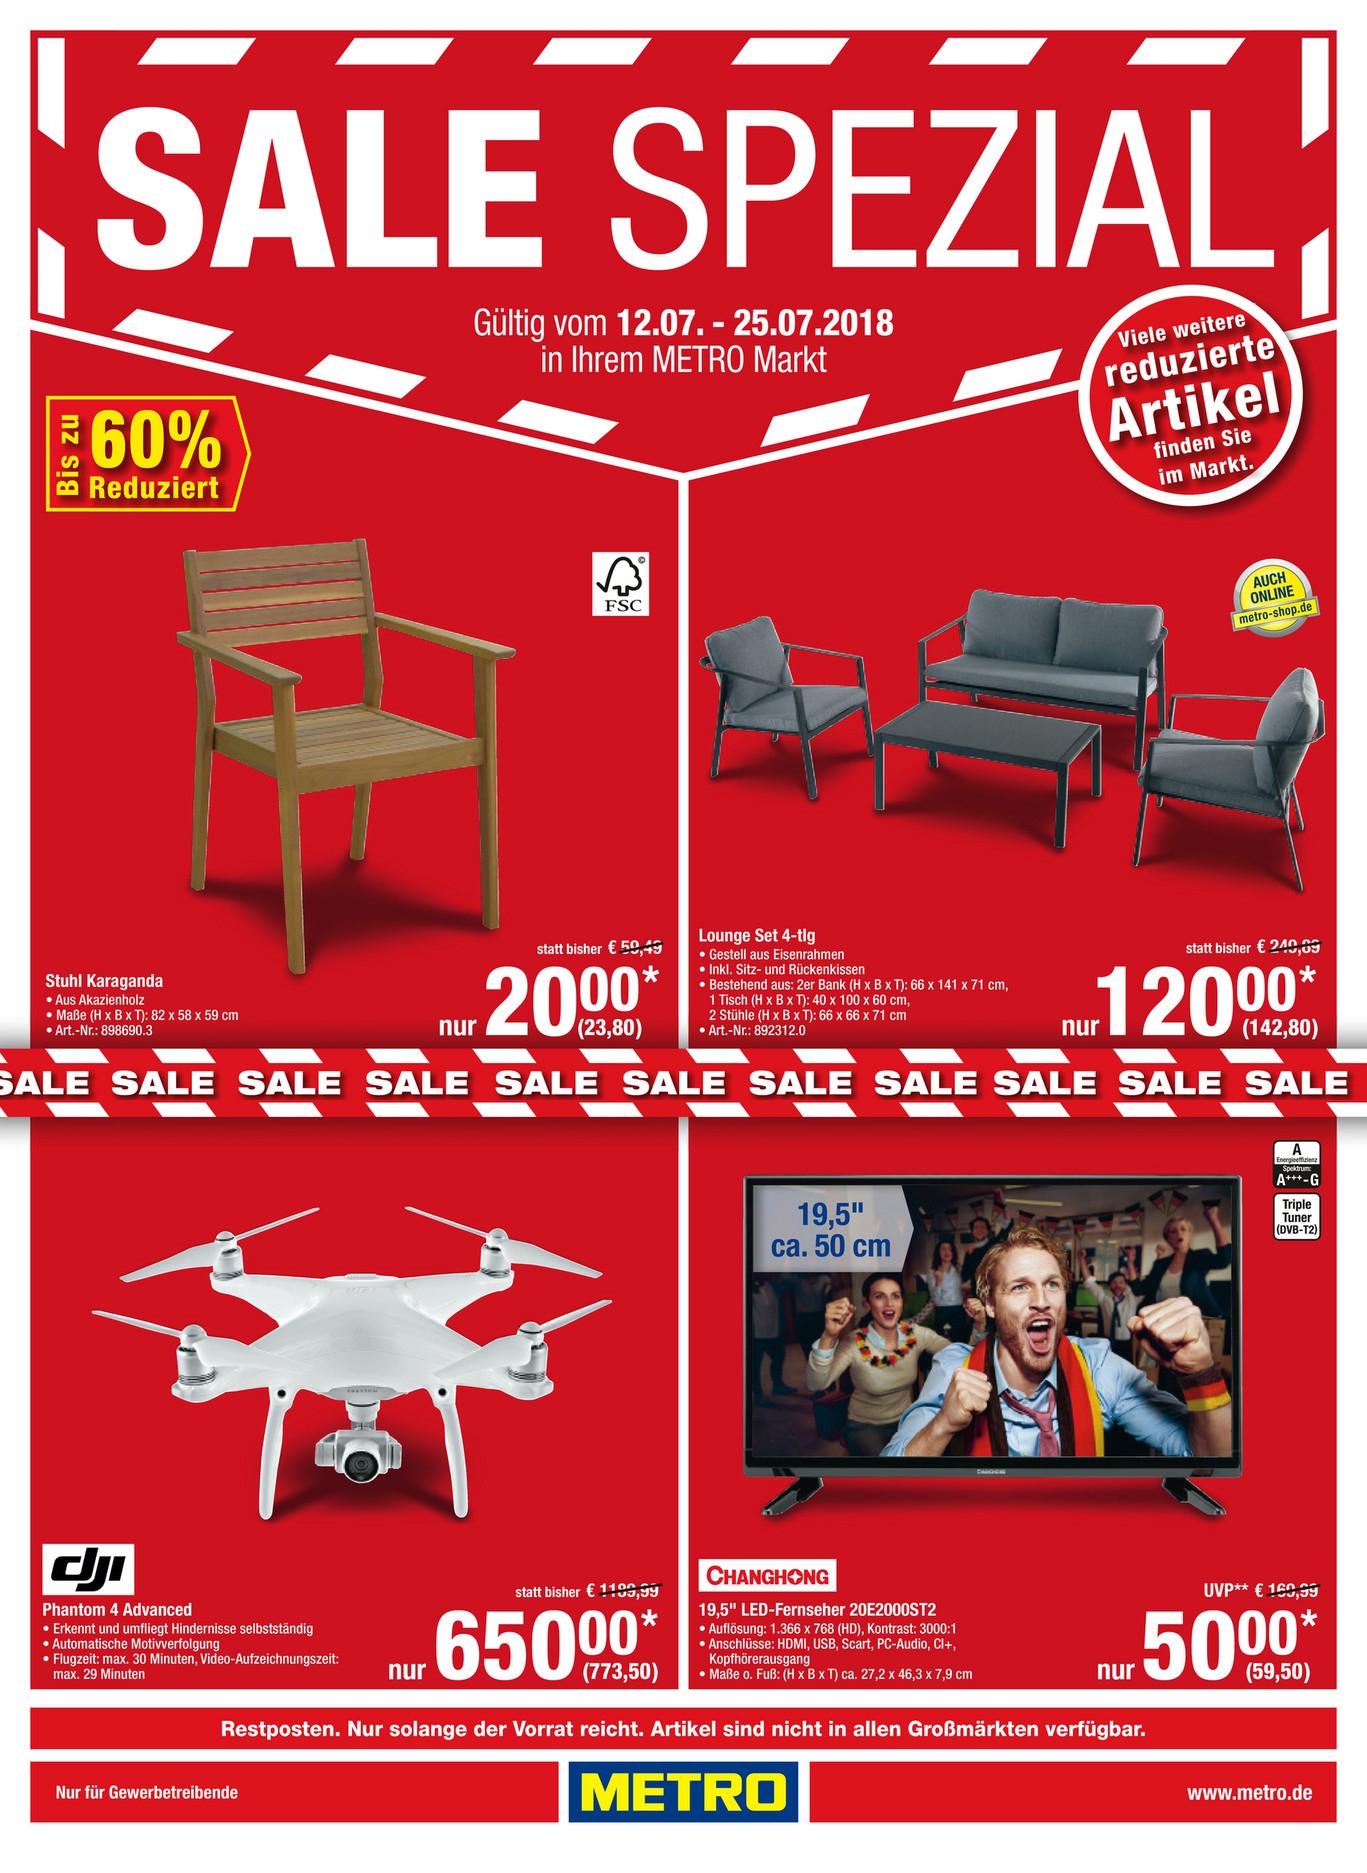 [ Metro ] Sale Ausverkauf ab 12.07. | u.a. DJI Phantom Advanced 773,5€ Tolino Epos 148,75€...